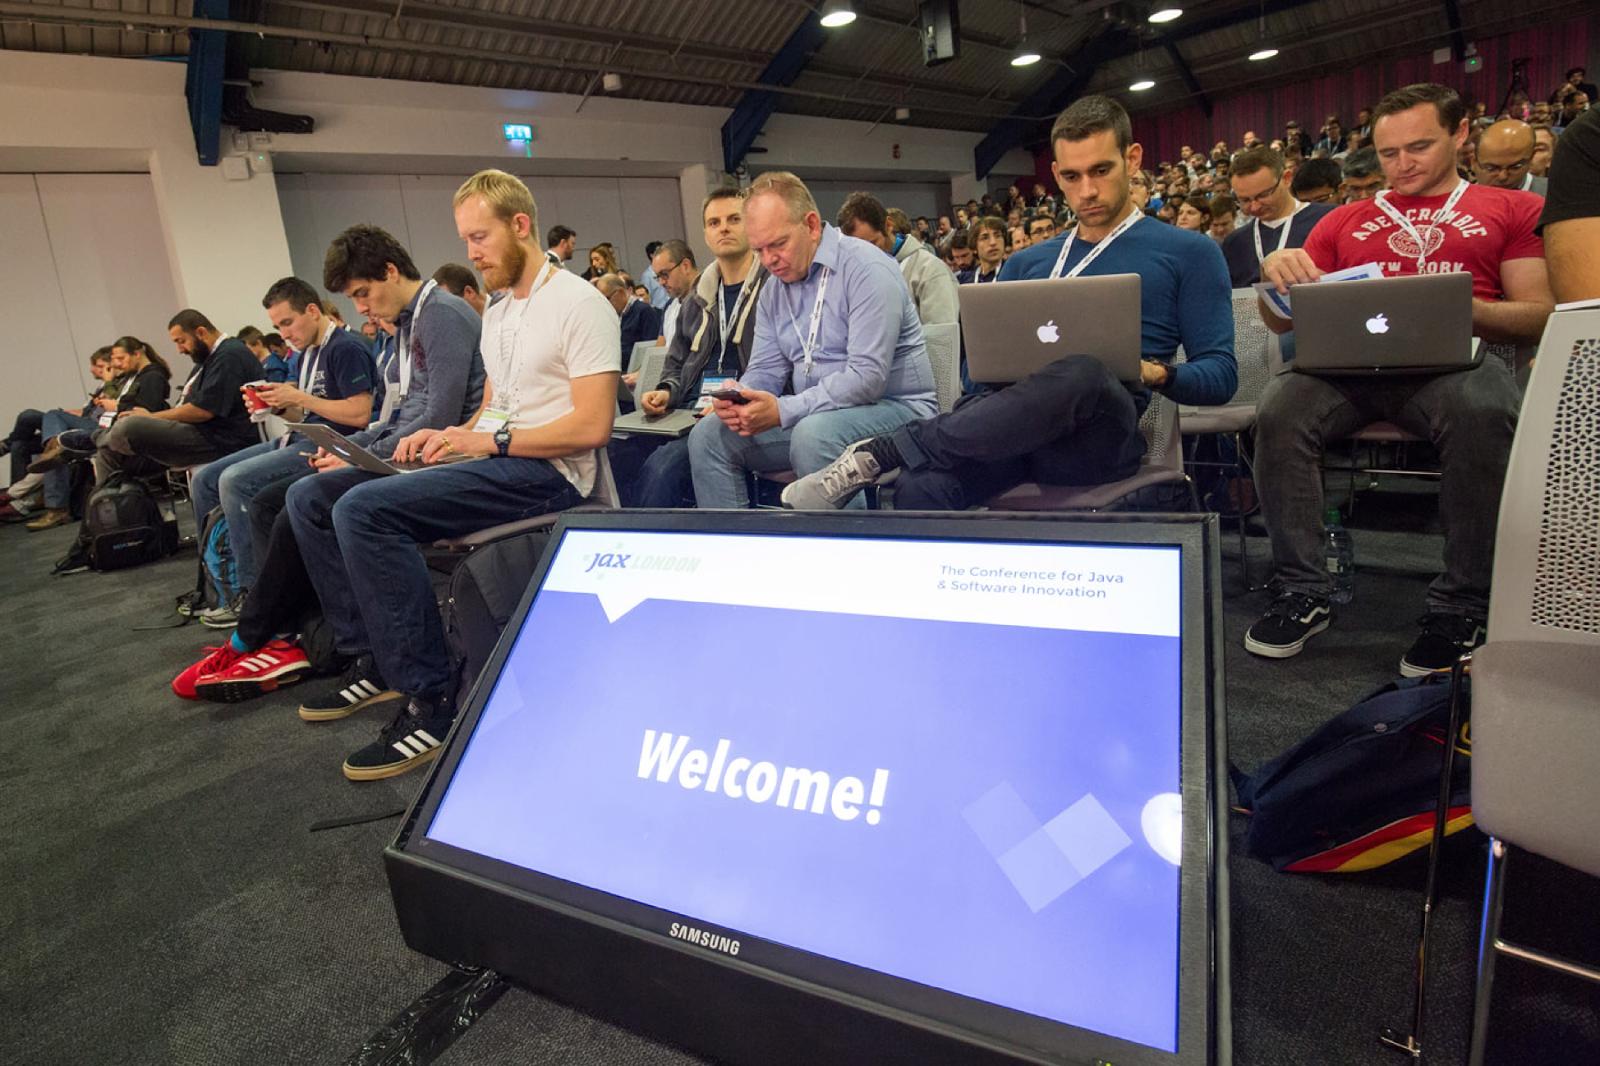 Java конференция с английскими корнями. Обзор размера XXXL